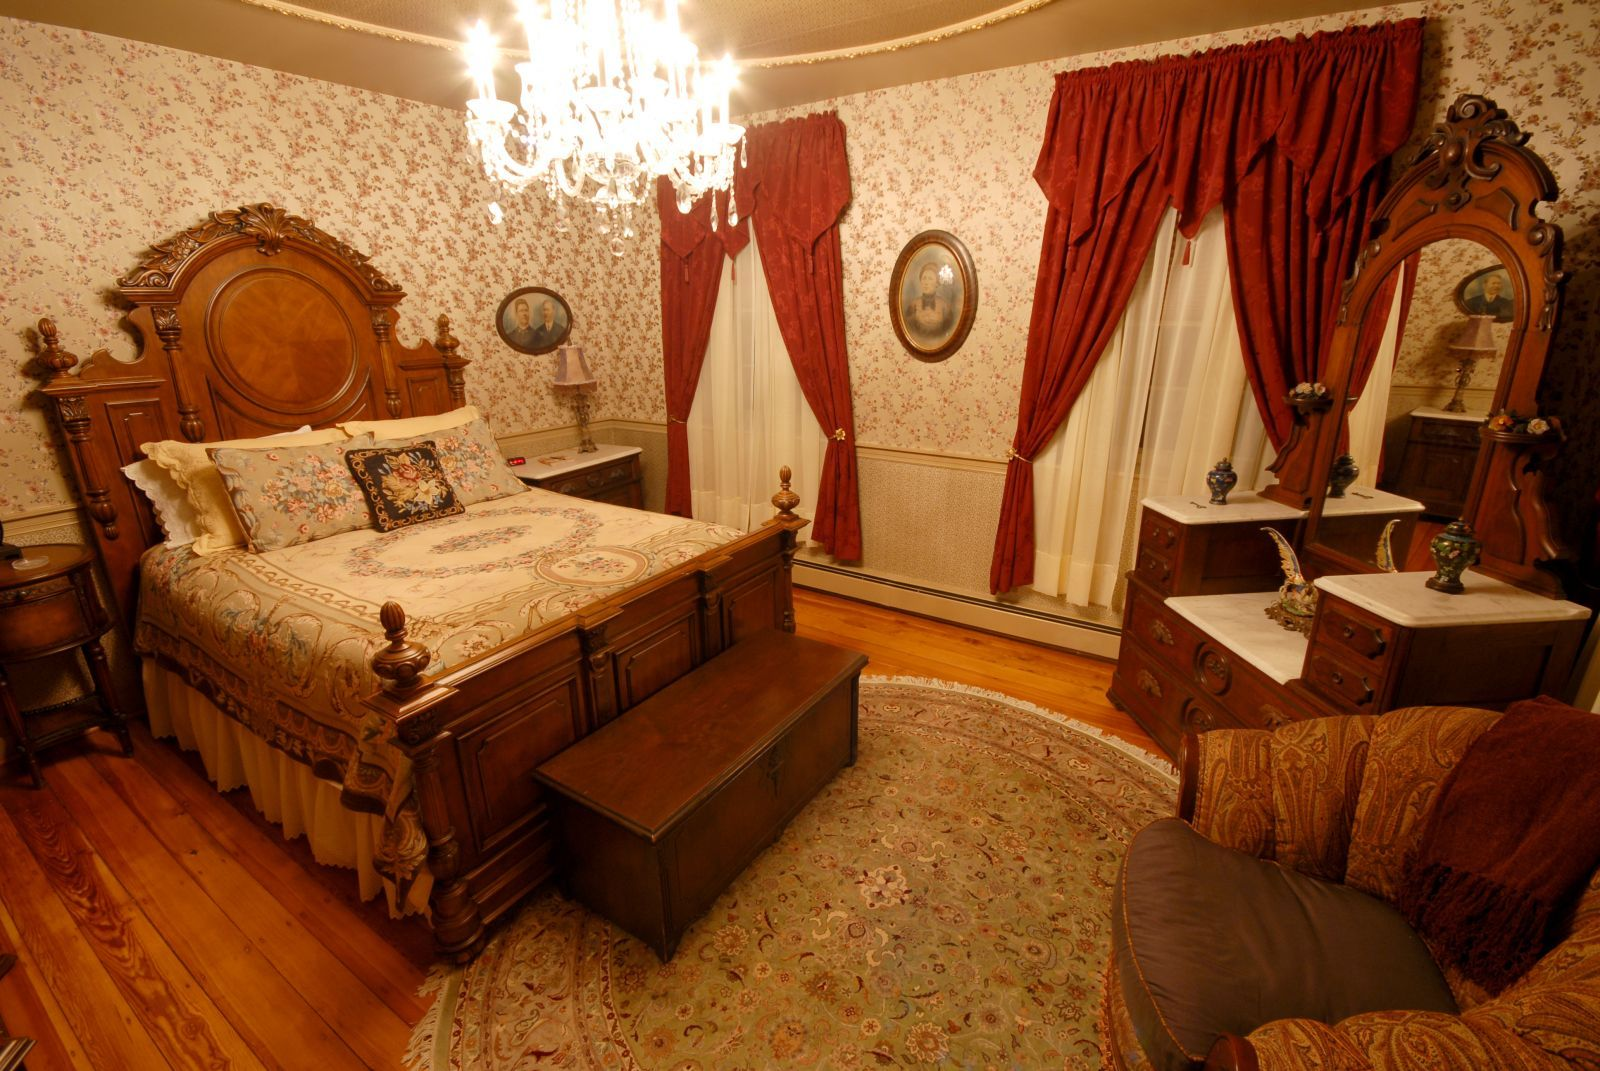 Victorian decorating ideas main bedroom design victorian for Main bedroom ideas